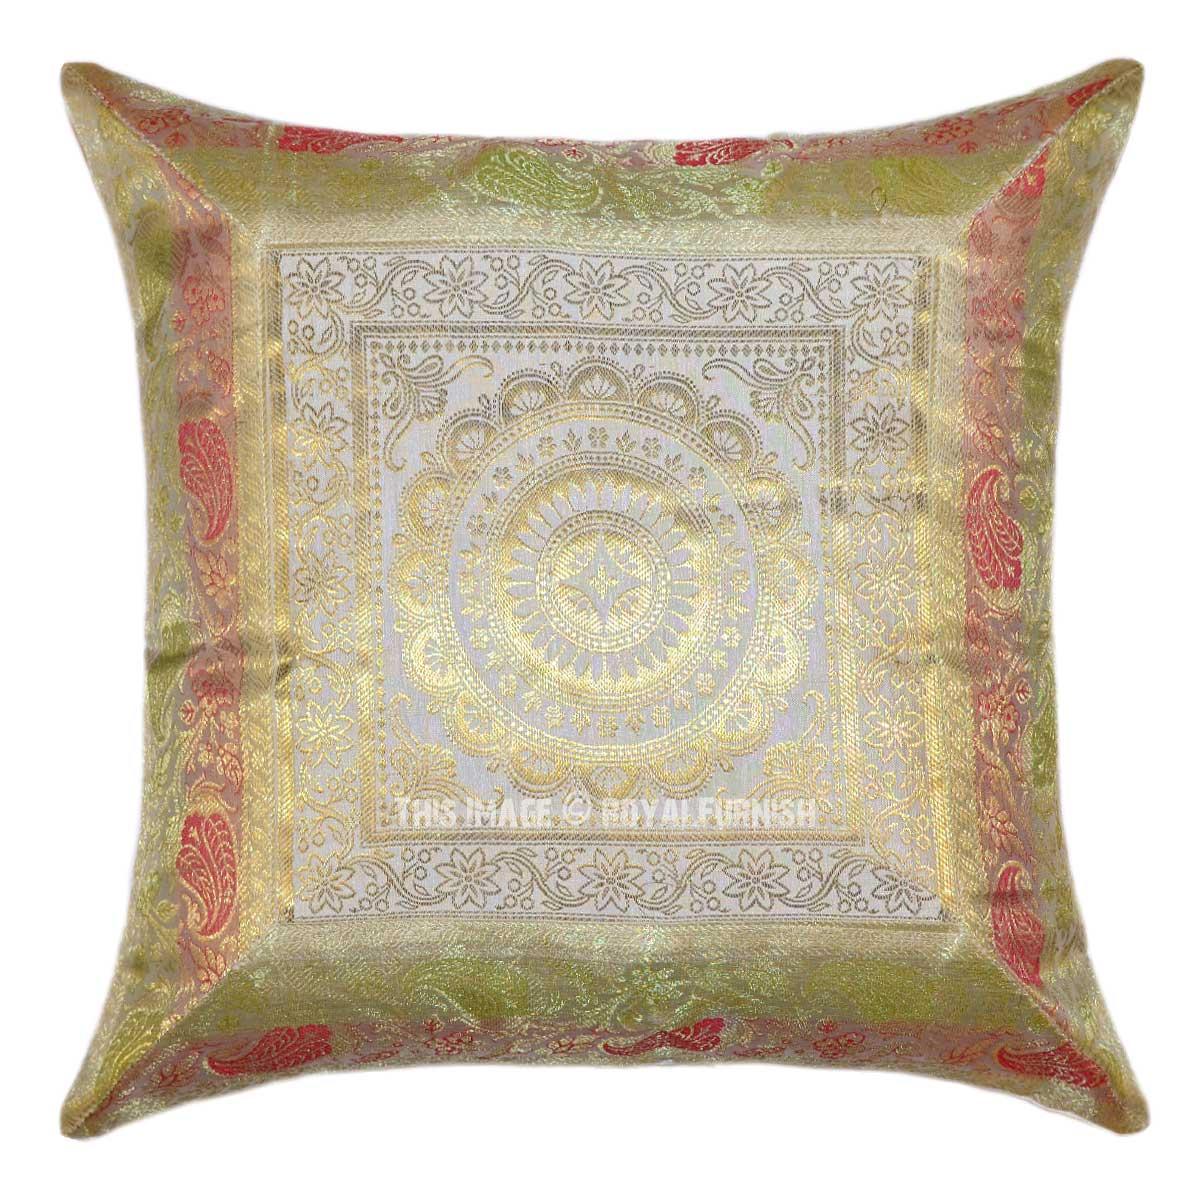 White Floral Medallion Mandala Circle Silk Throw Pillow